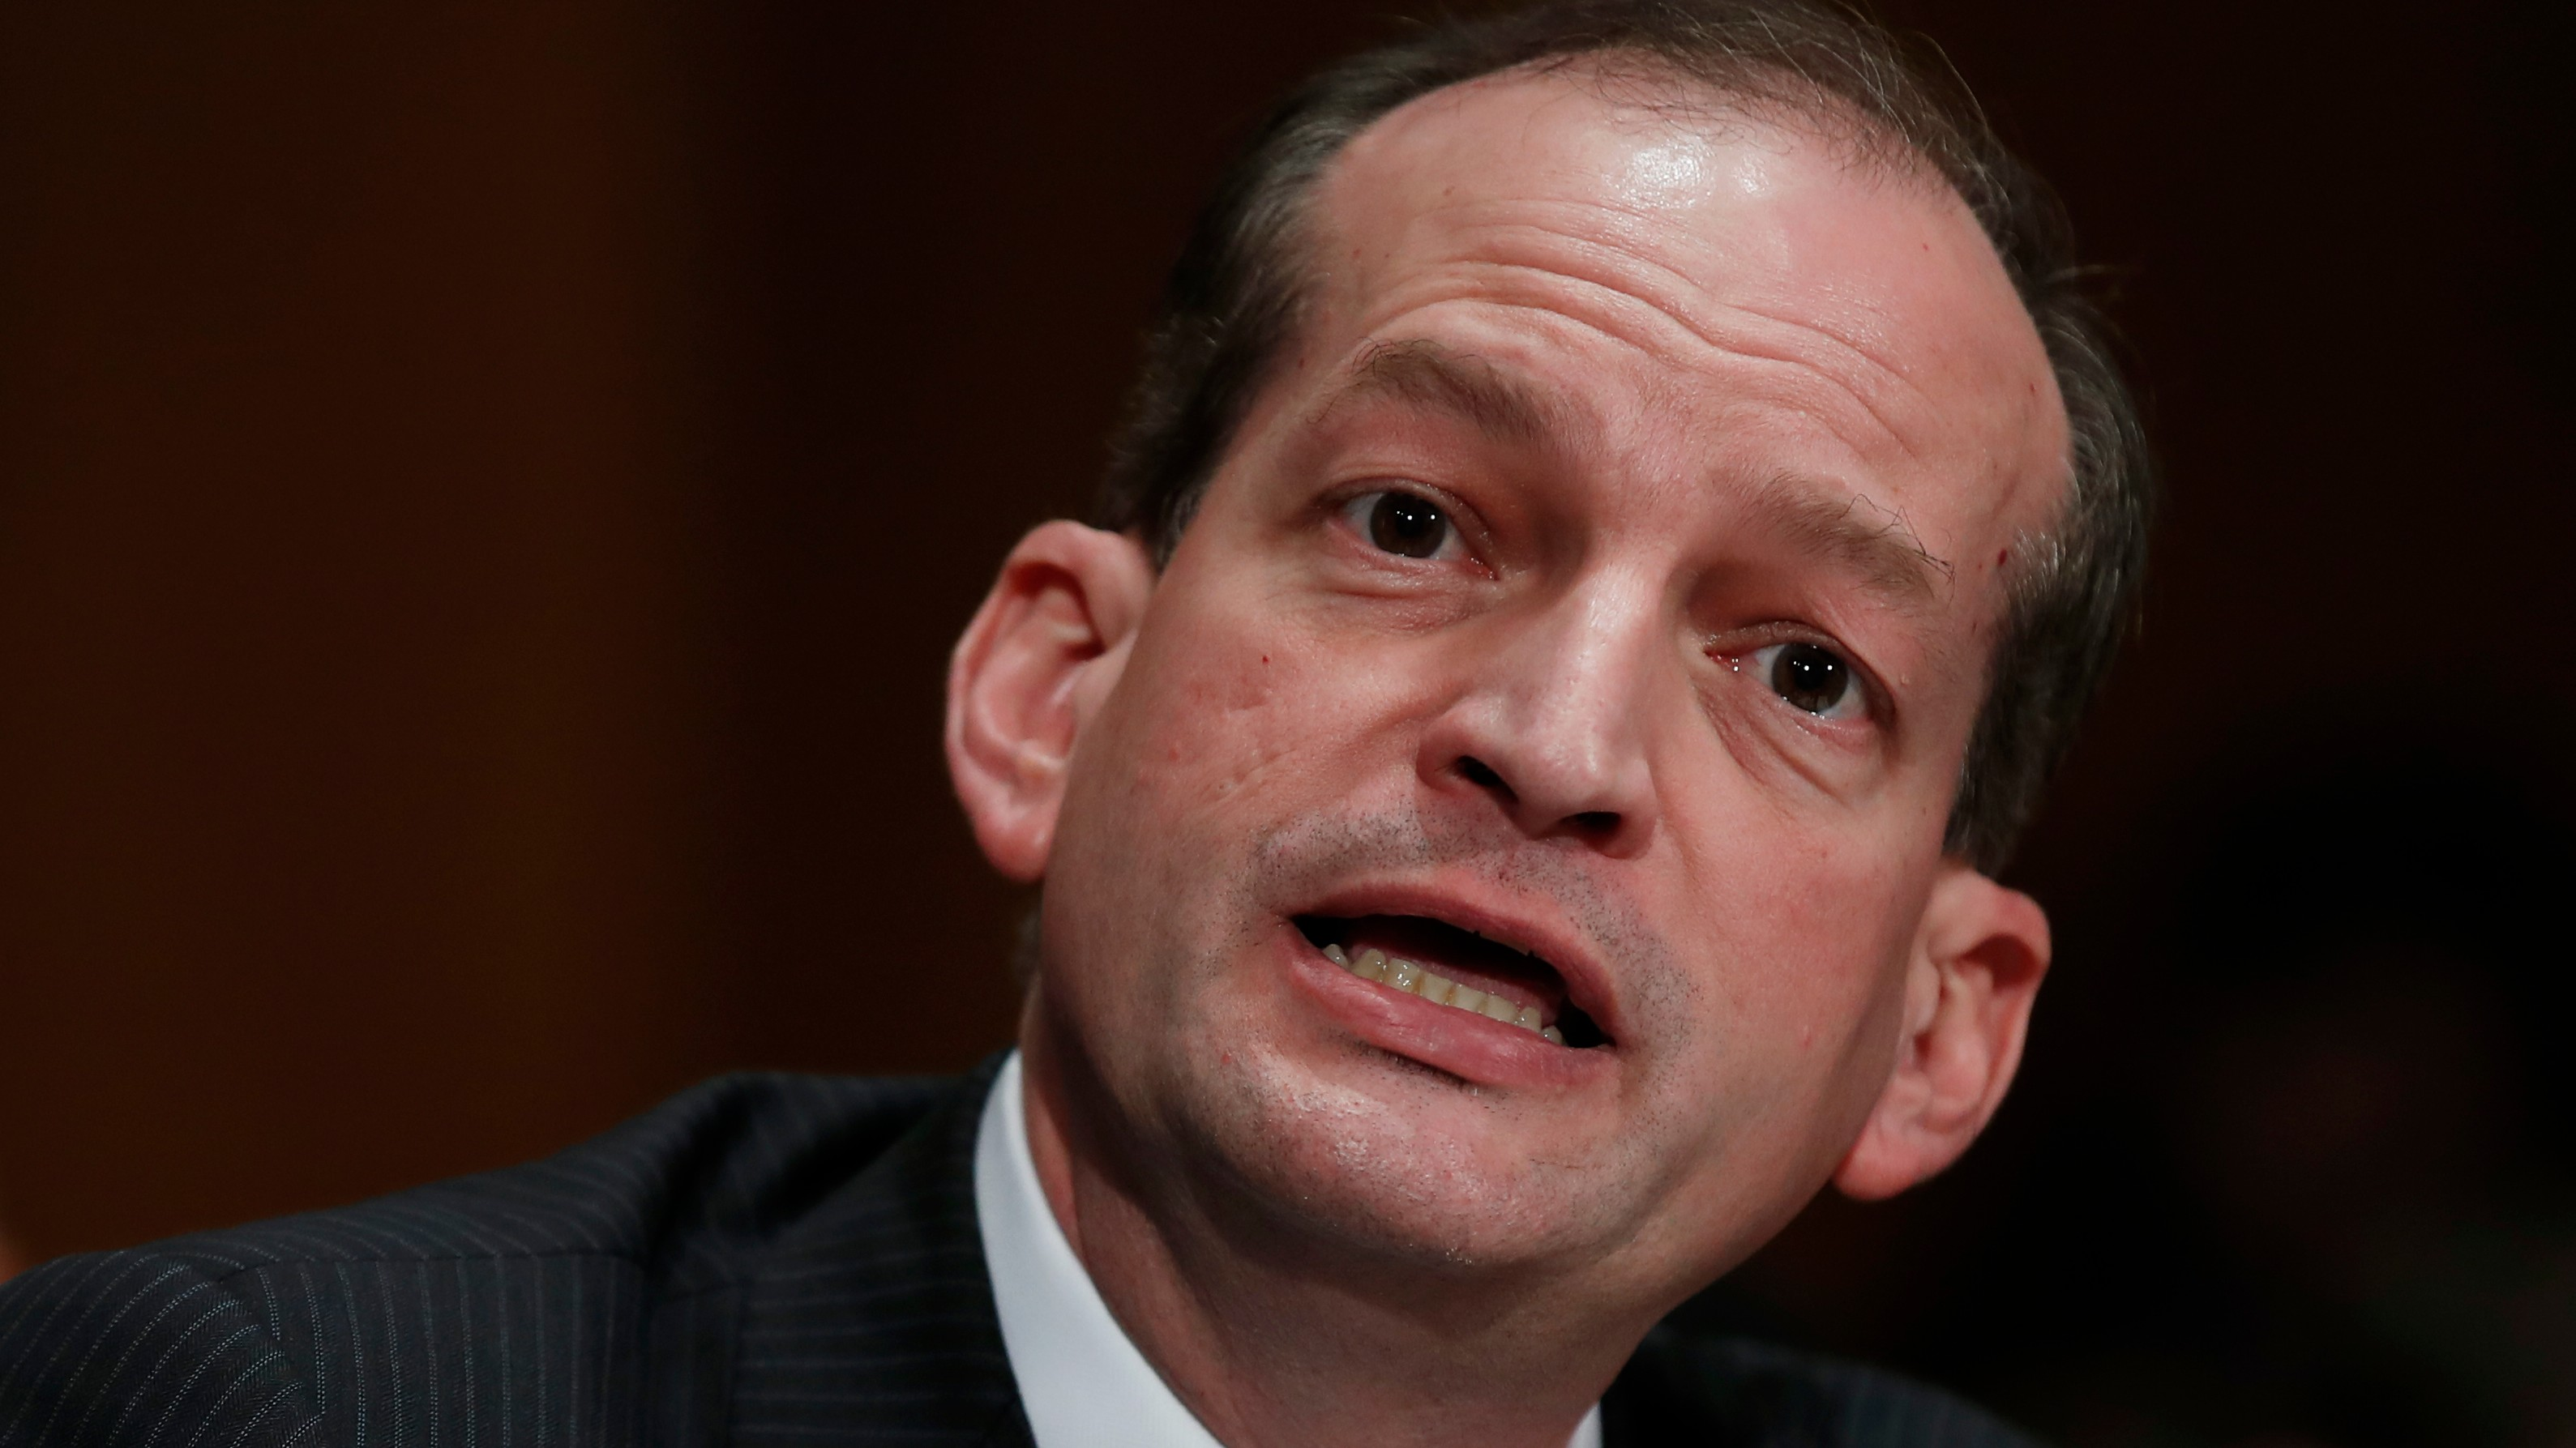 Flipboard: Democrats Want Trump's Labor Secretary to